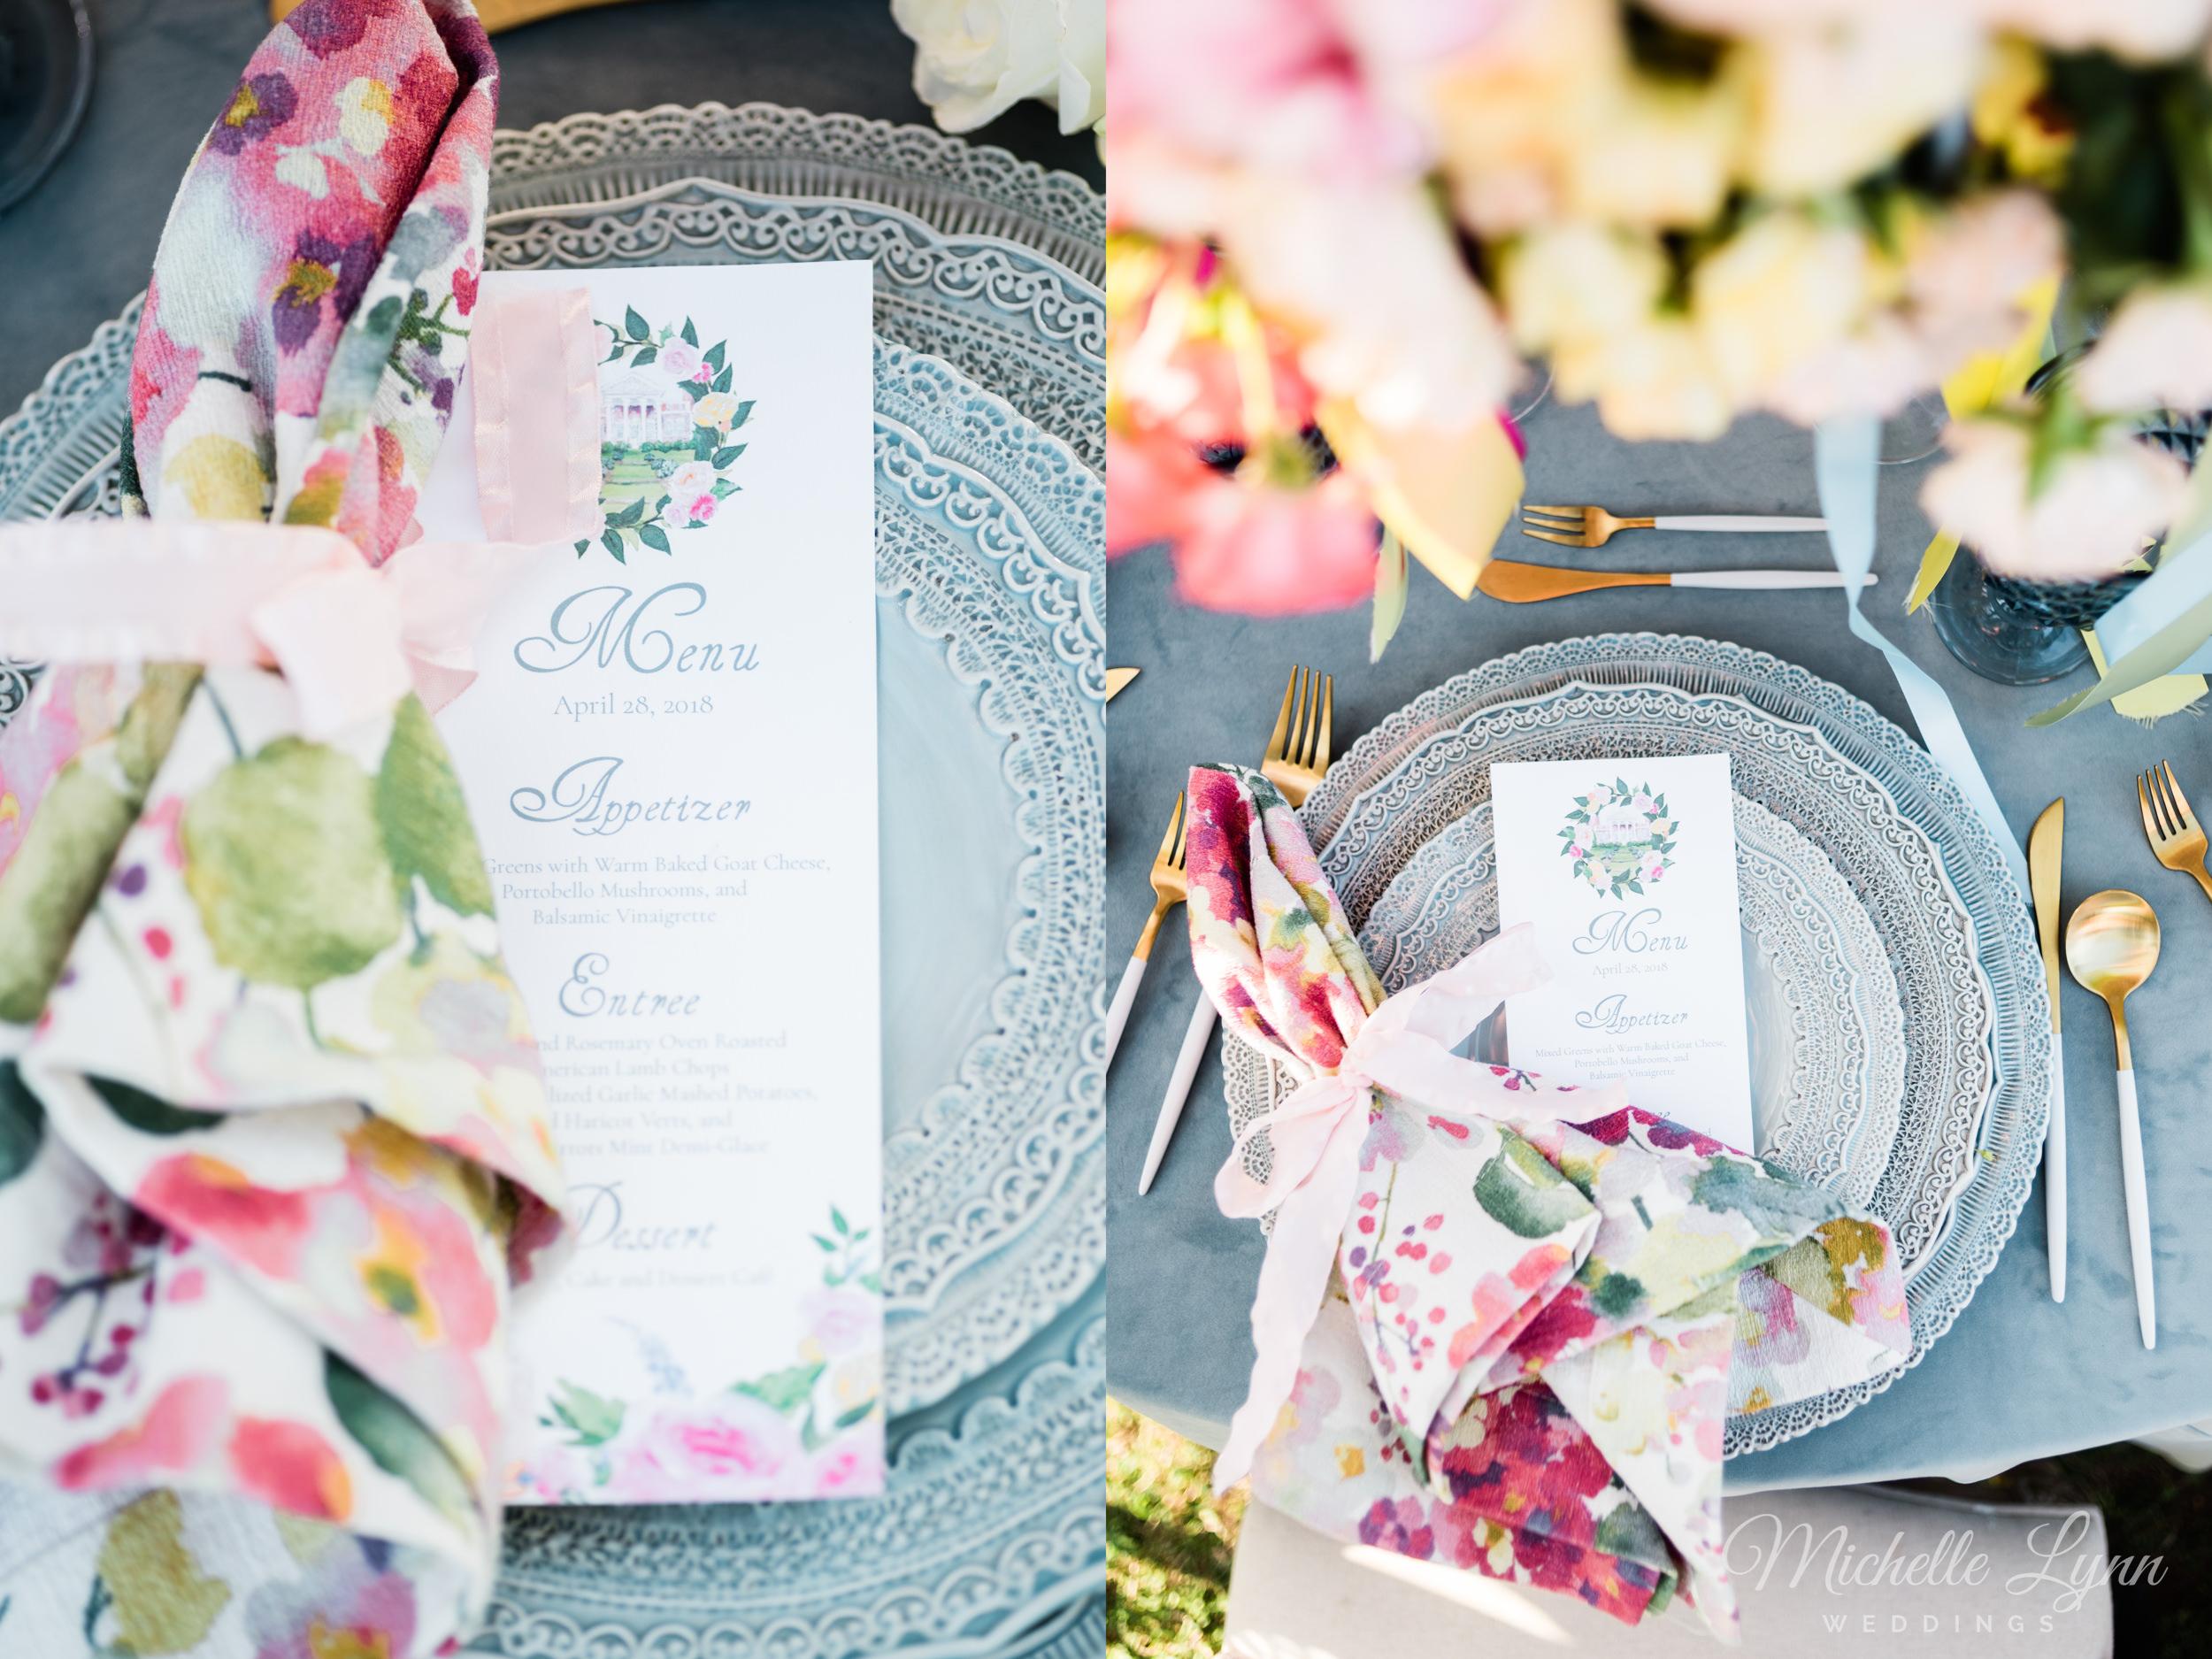 mlw-whitehall-annapolis-maryland-wedding-23.jpg